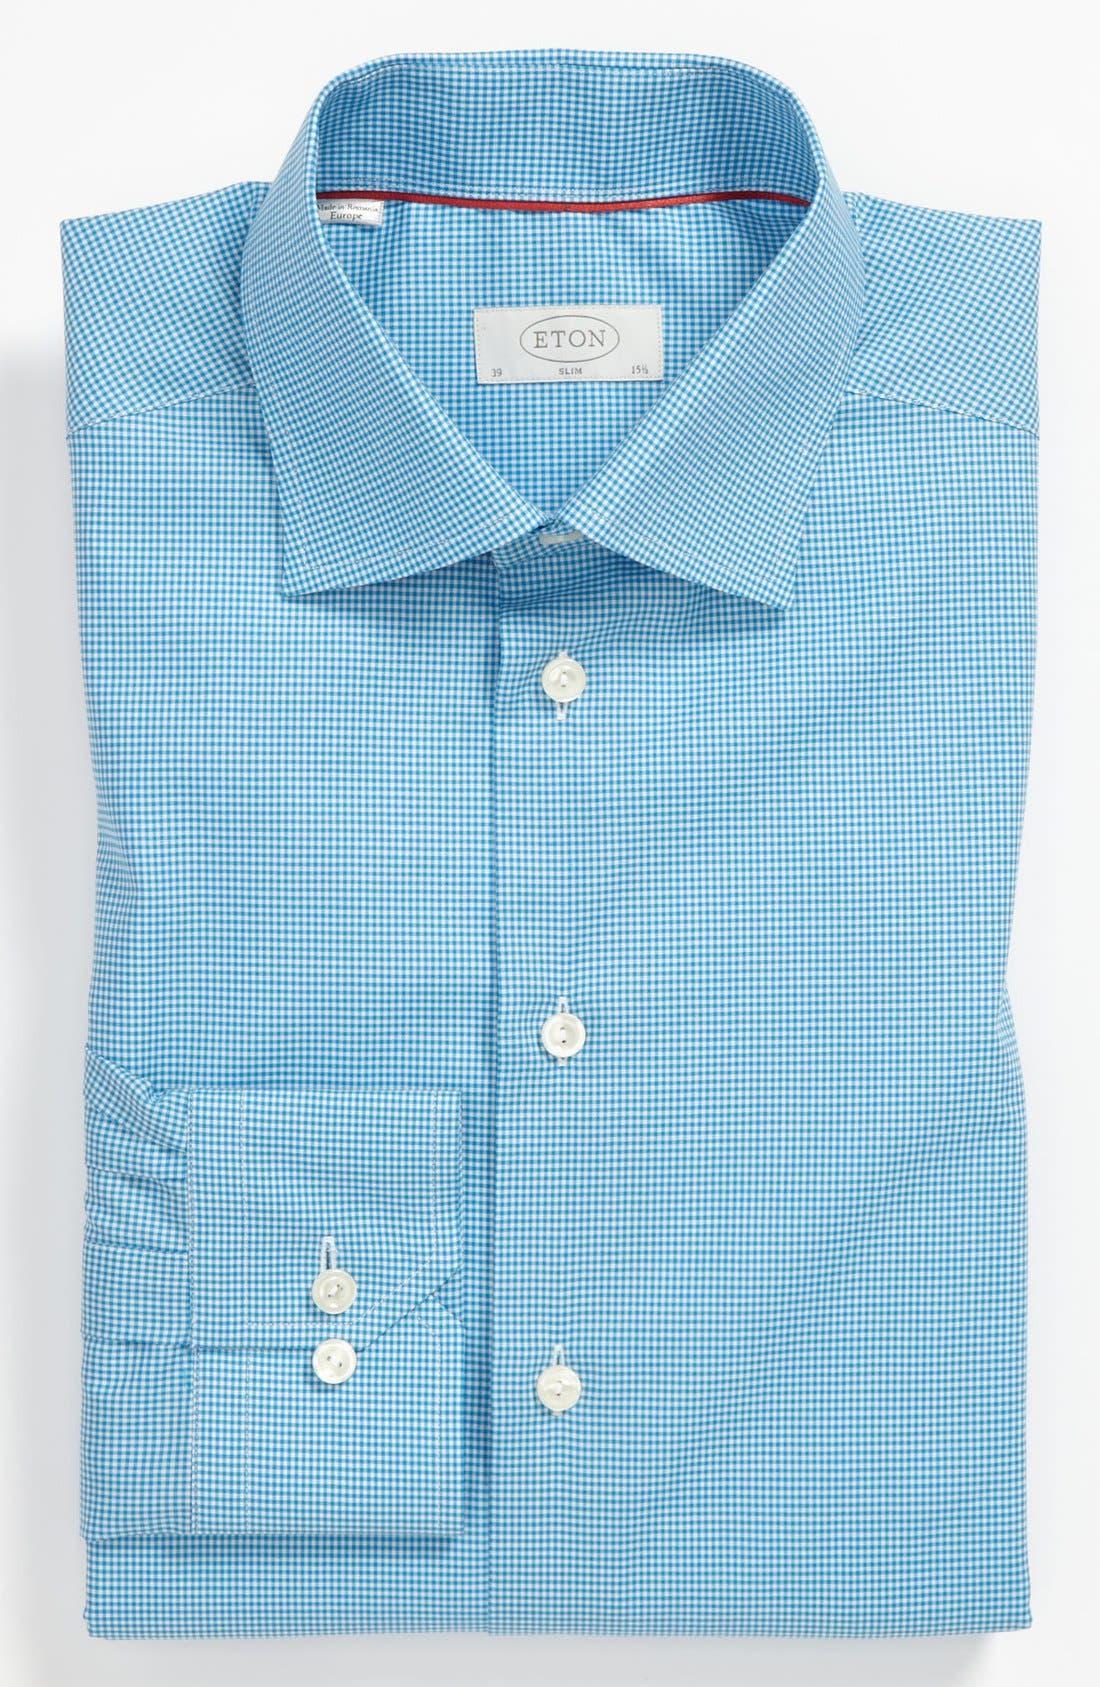 Alternate Image 1 Selected - Eton Slim Fit Dress Shirt